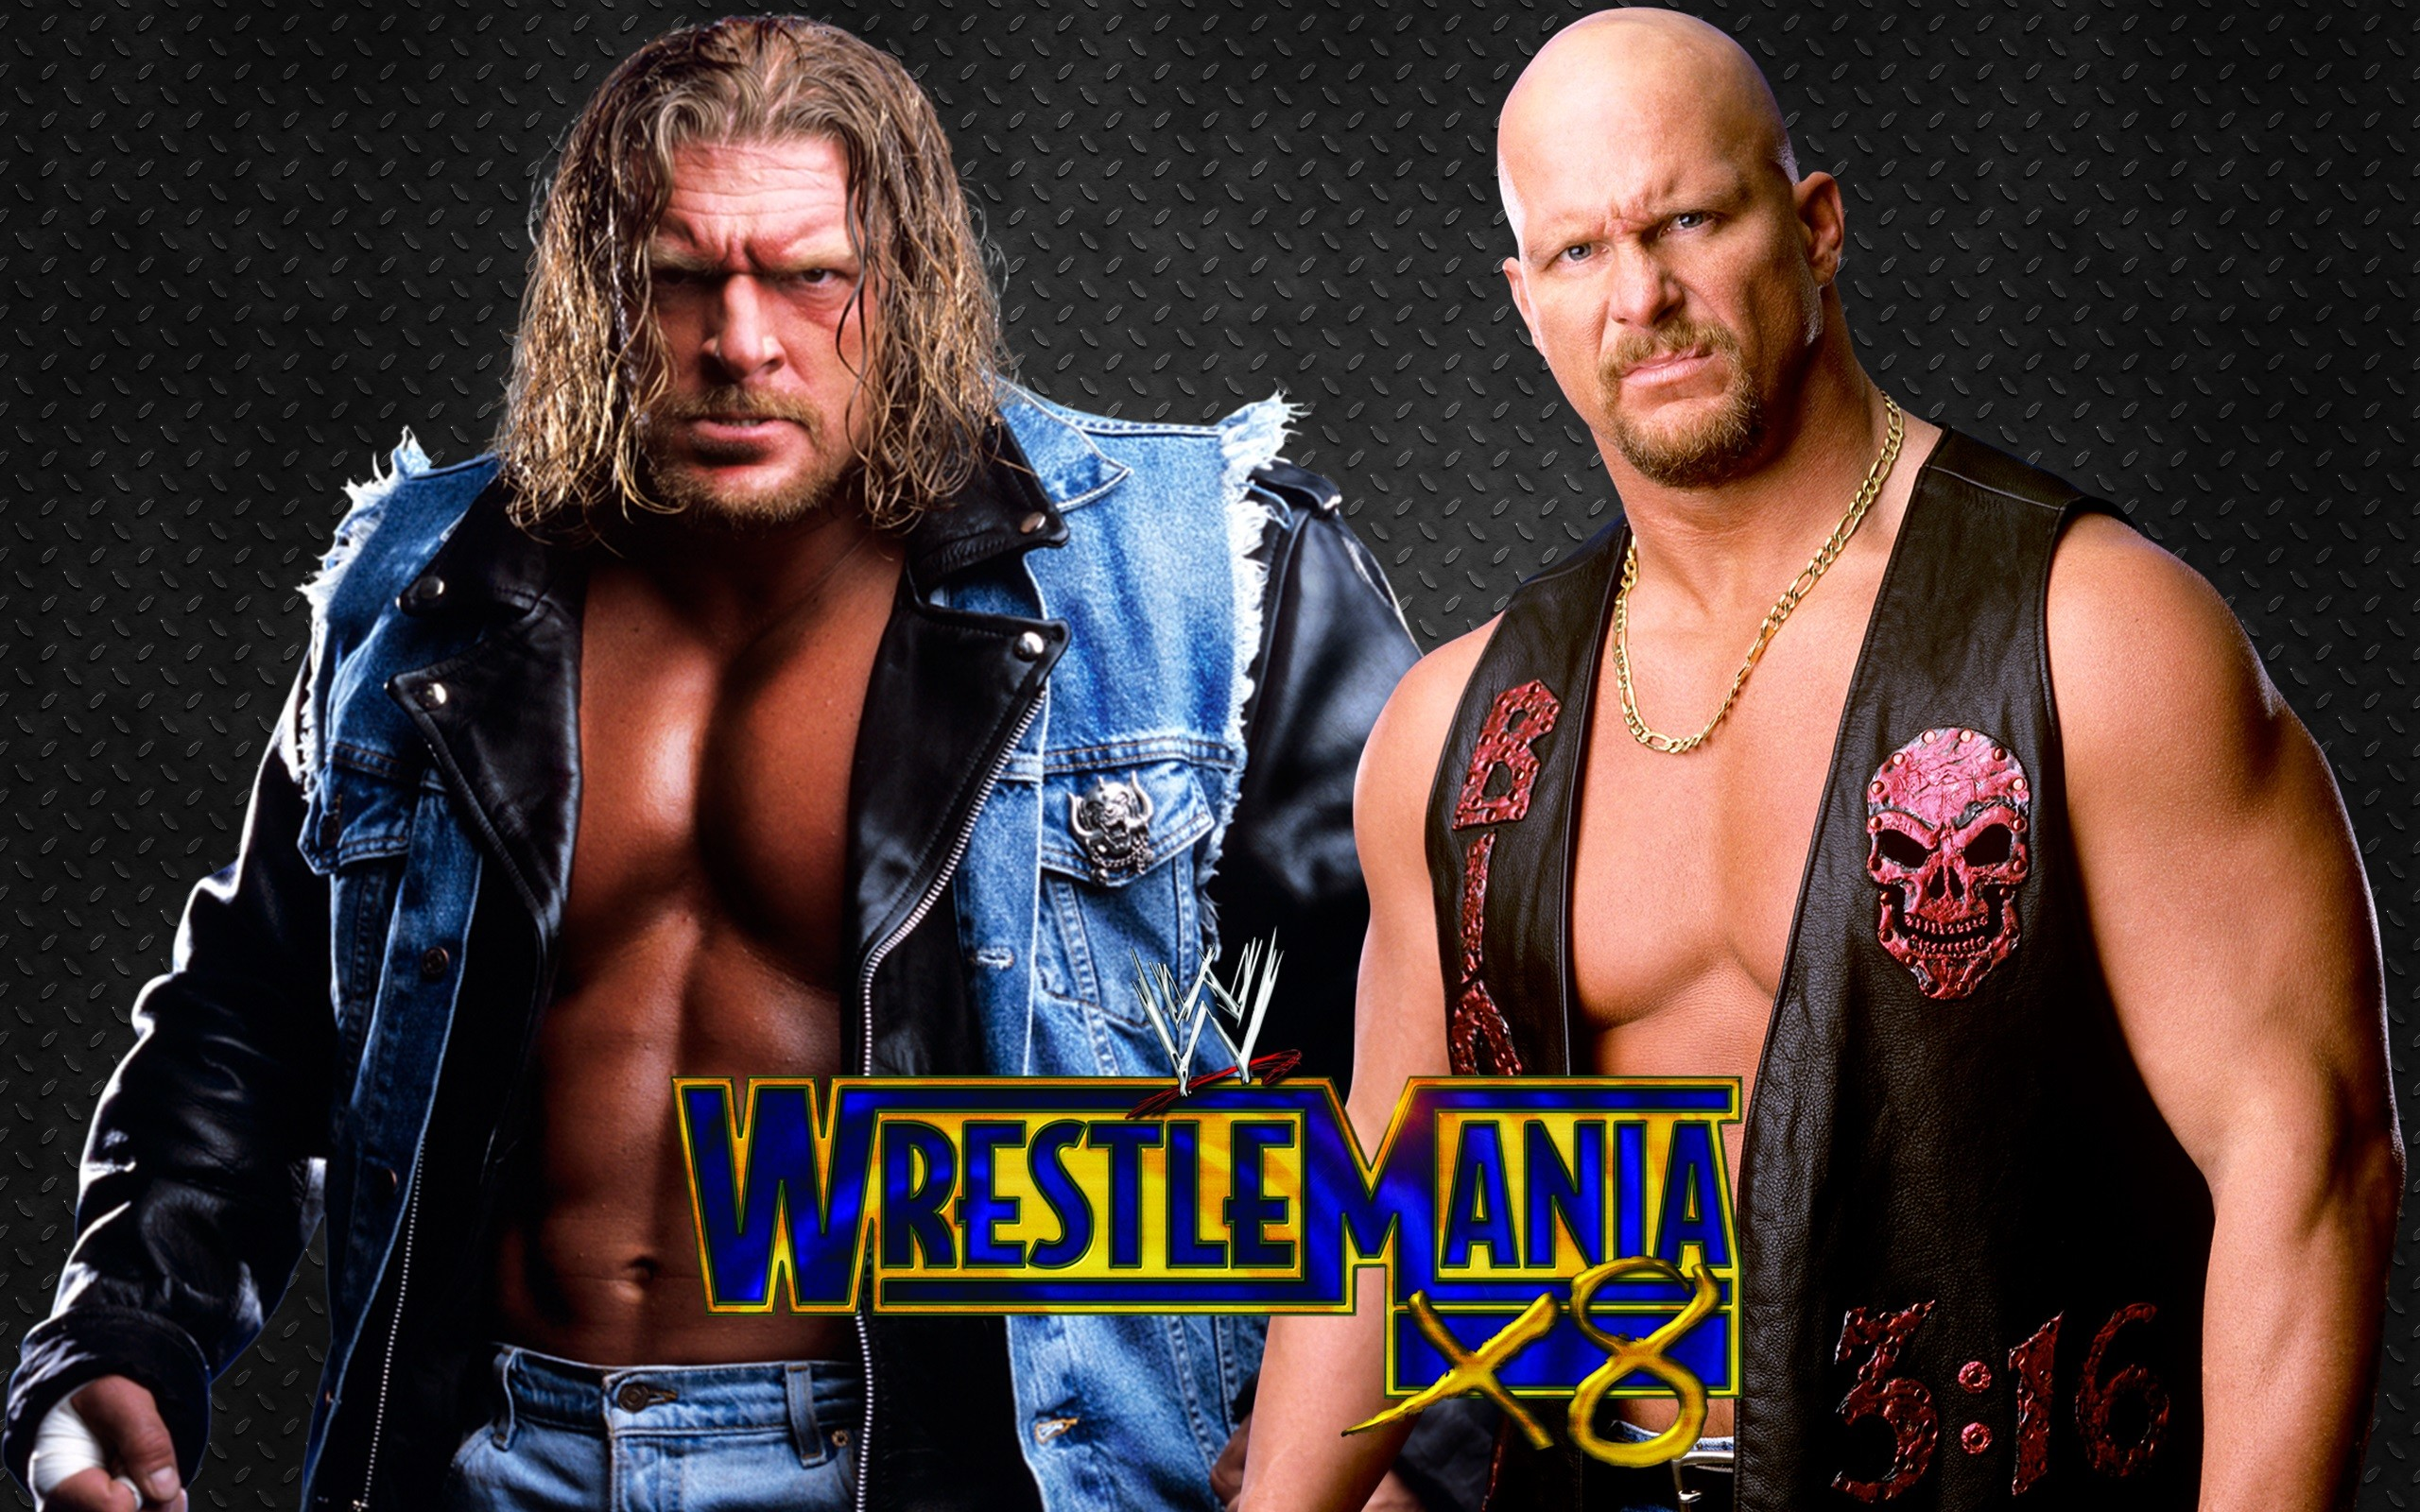 Stone Cold Steve Austin – WrestleMania 18